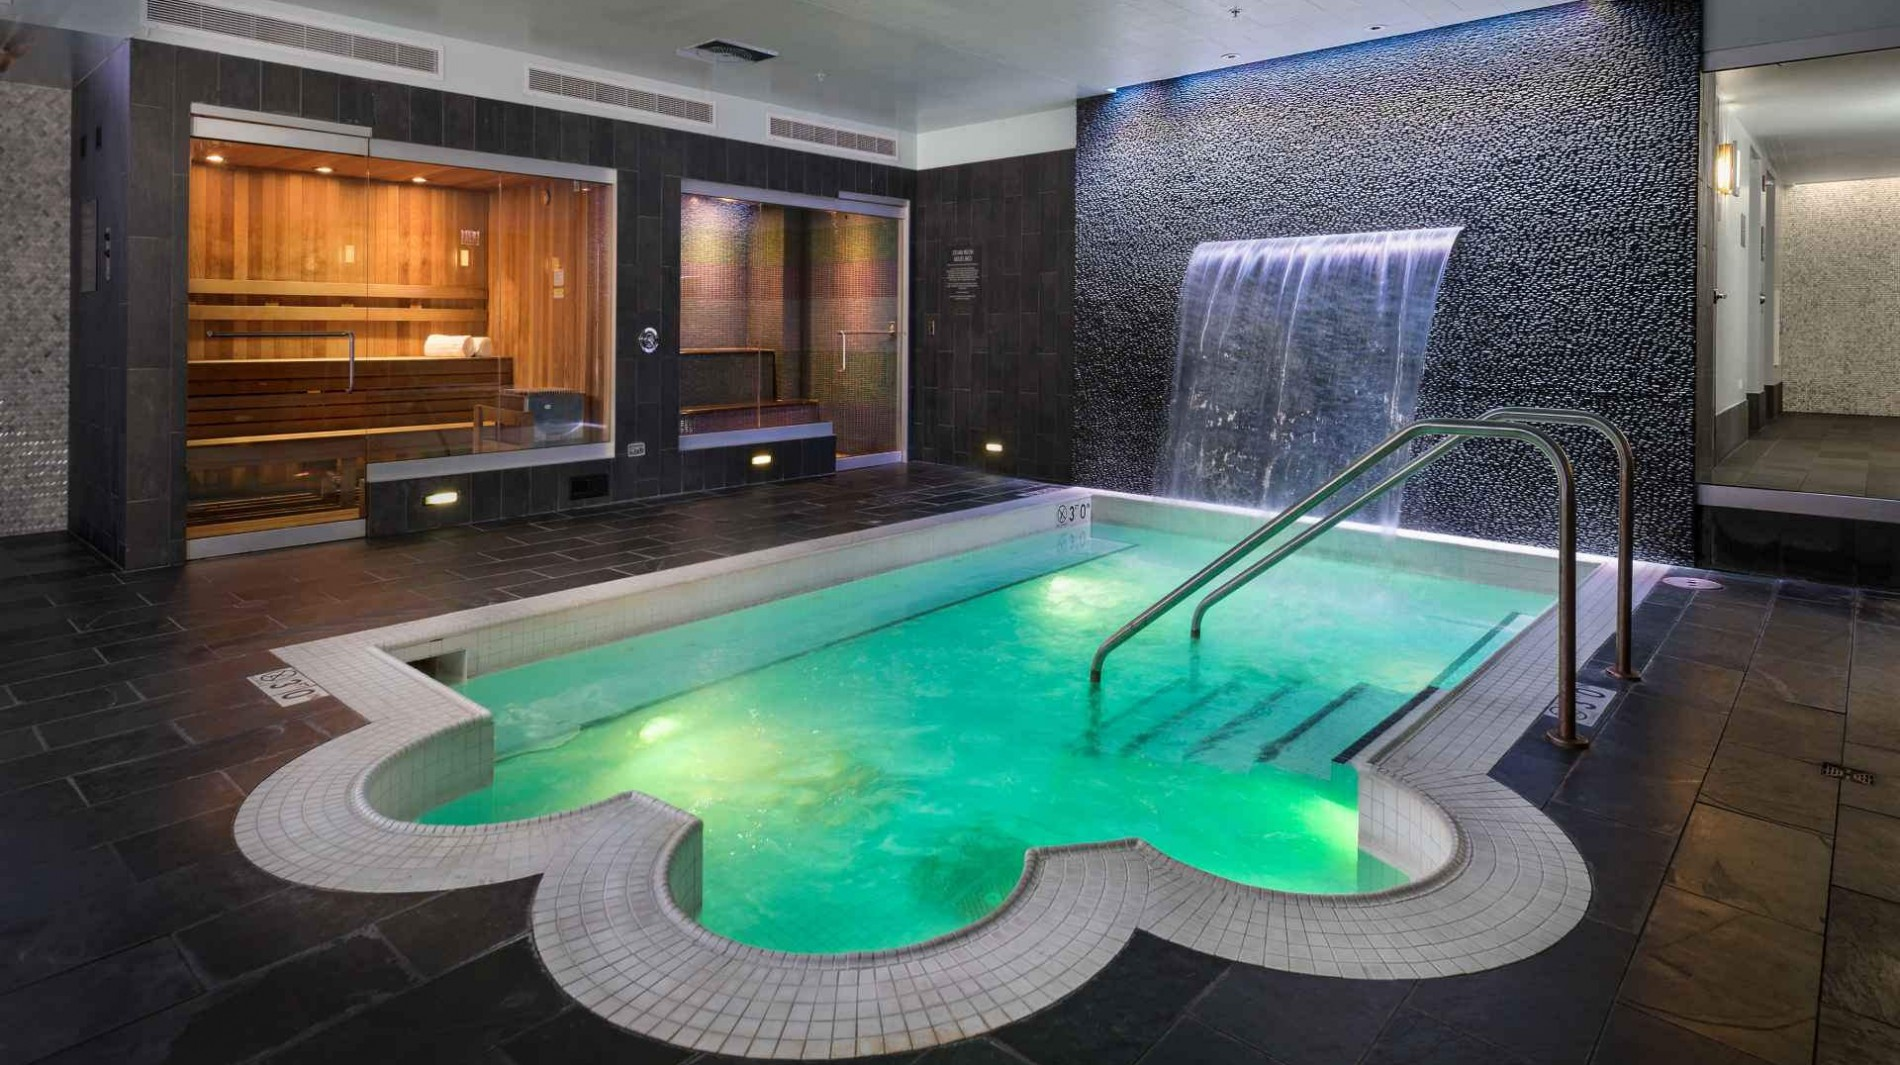 Serene indoor spa featuring indoor pool, steam room, sauna, and private massage room